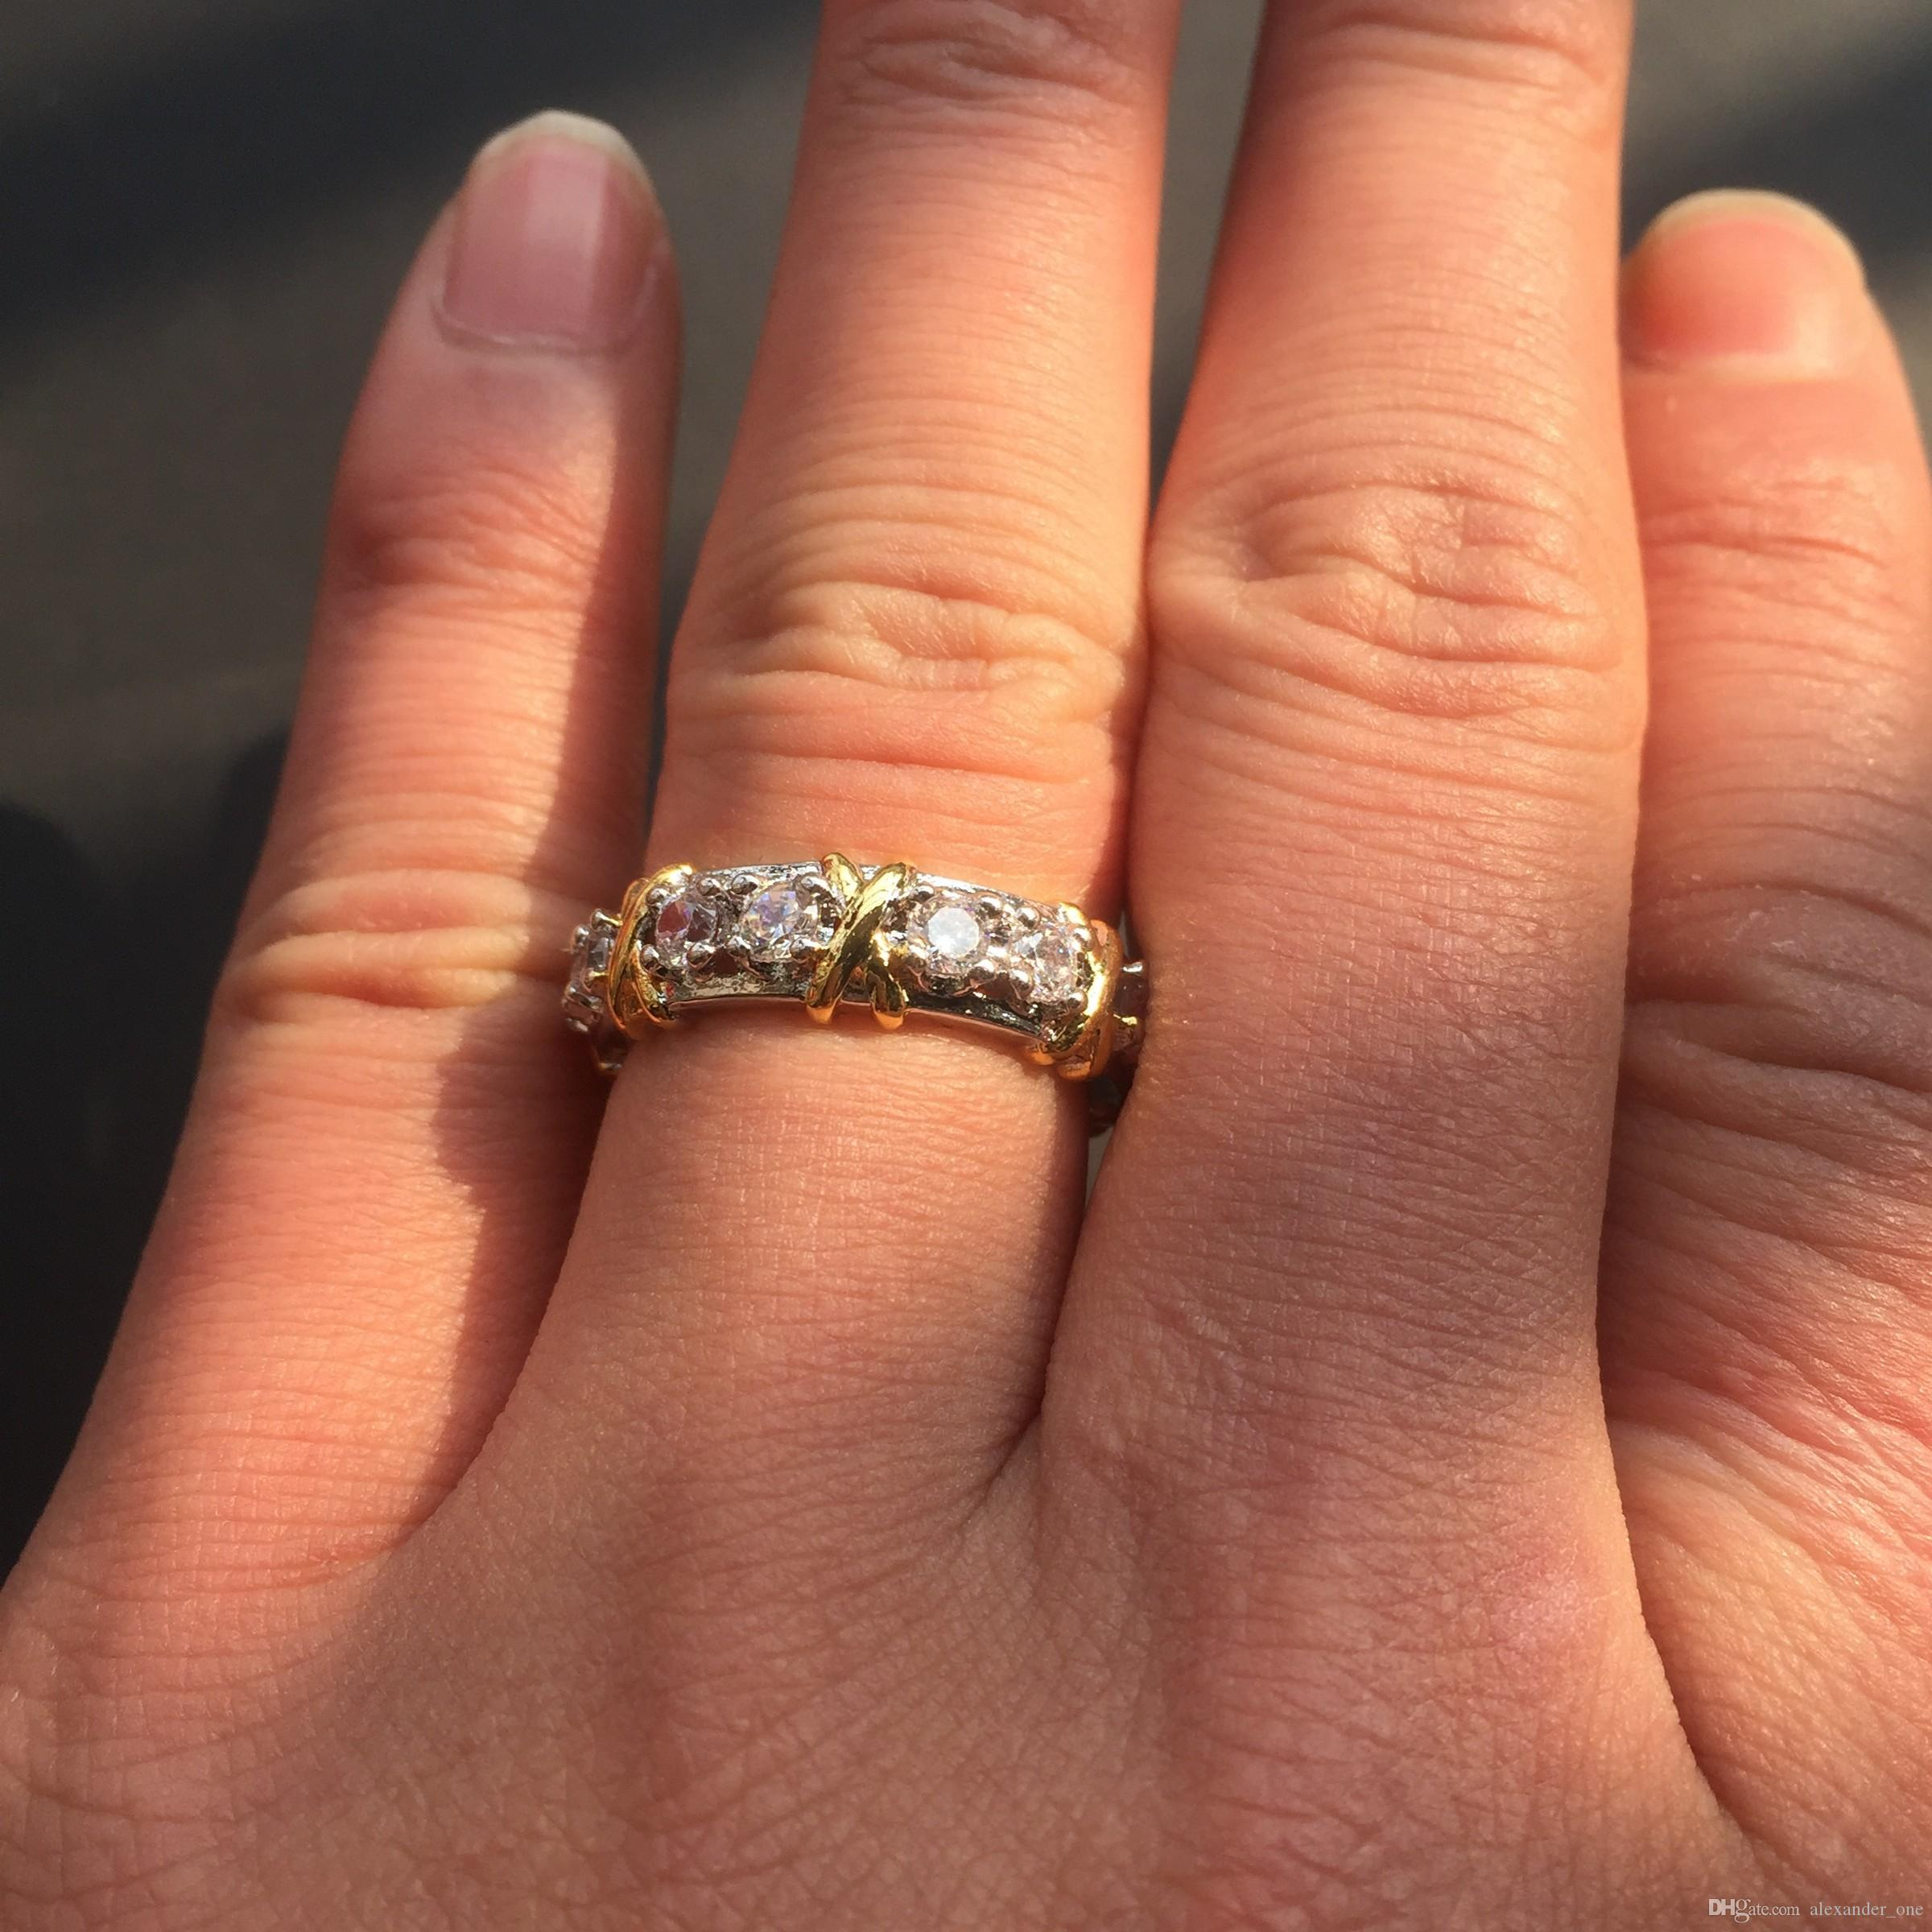 Marke Jewlery Frauen 925 Silber Simuliert Diamant Zirkonia Tansanit Gelbgold Kreuz Ewige Band Ehering